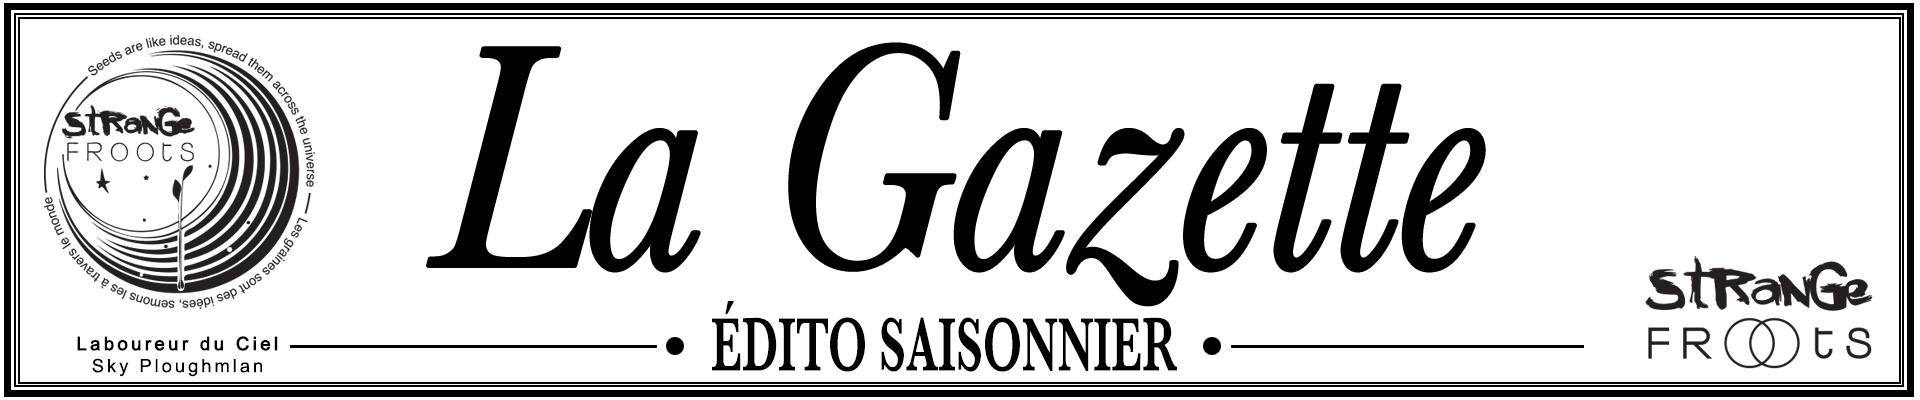 La-gazette-strange-froots